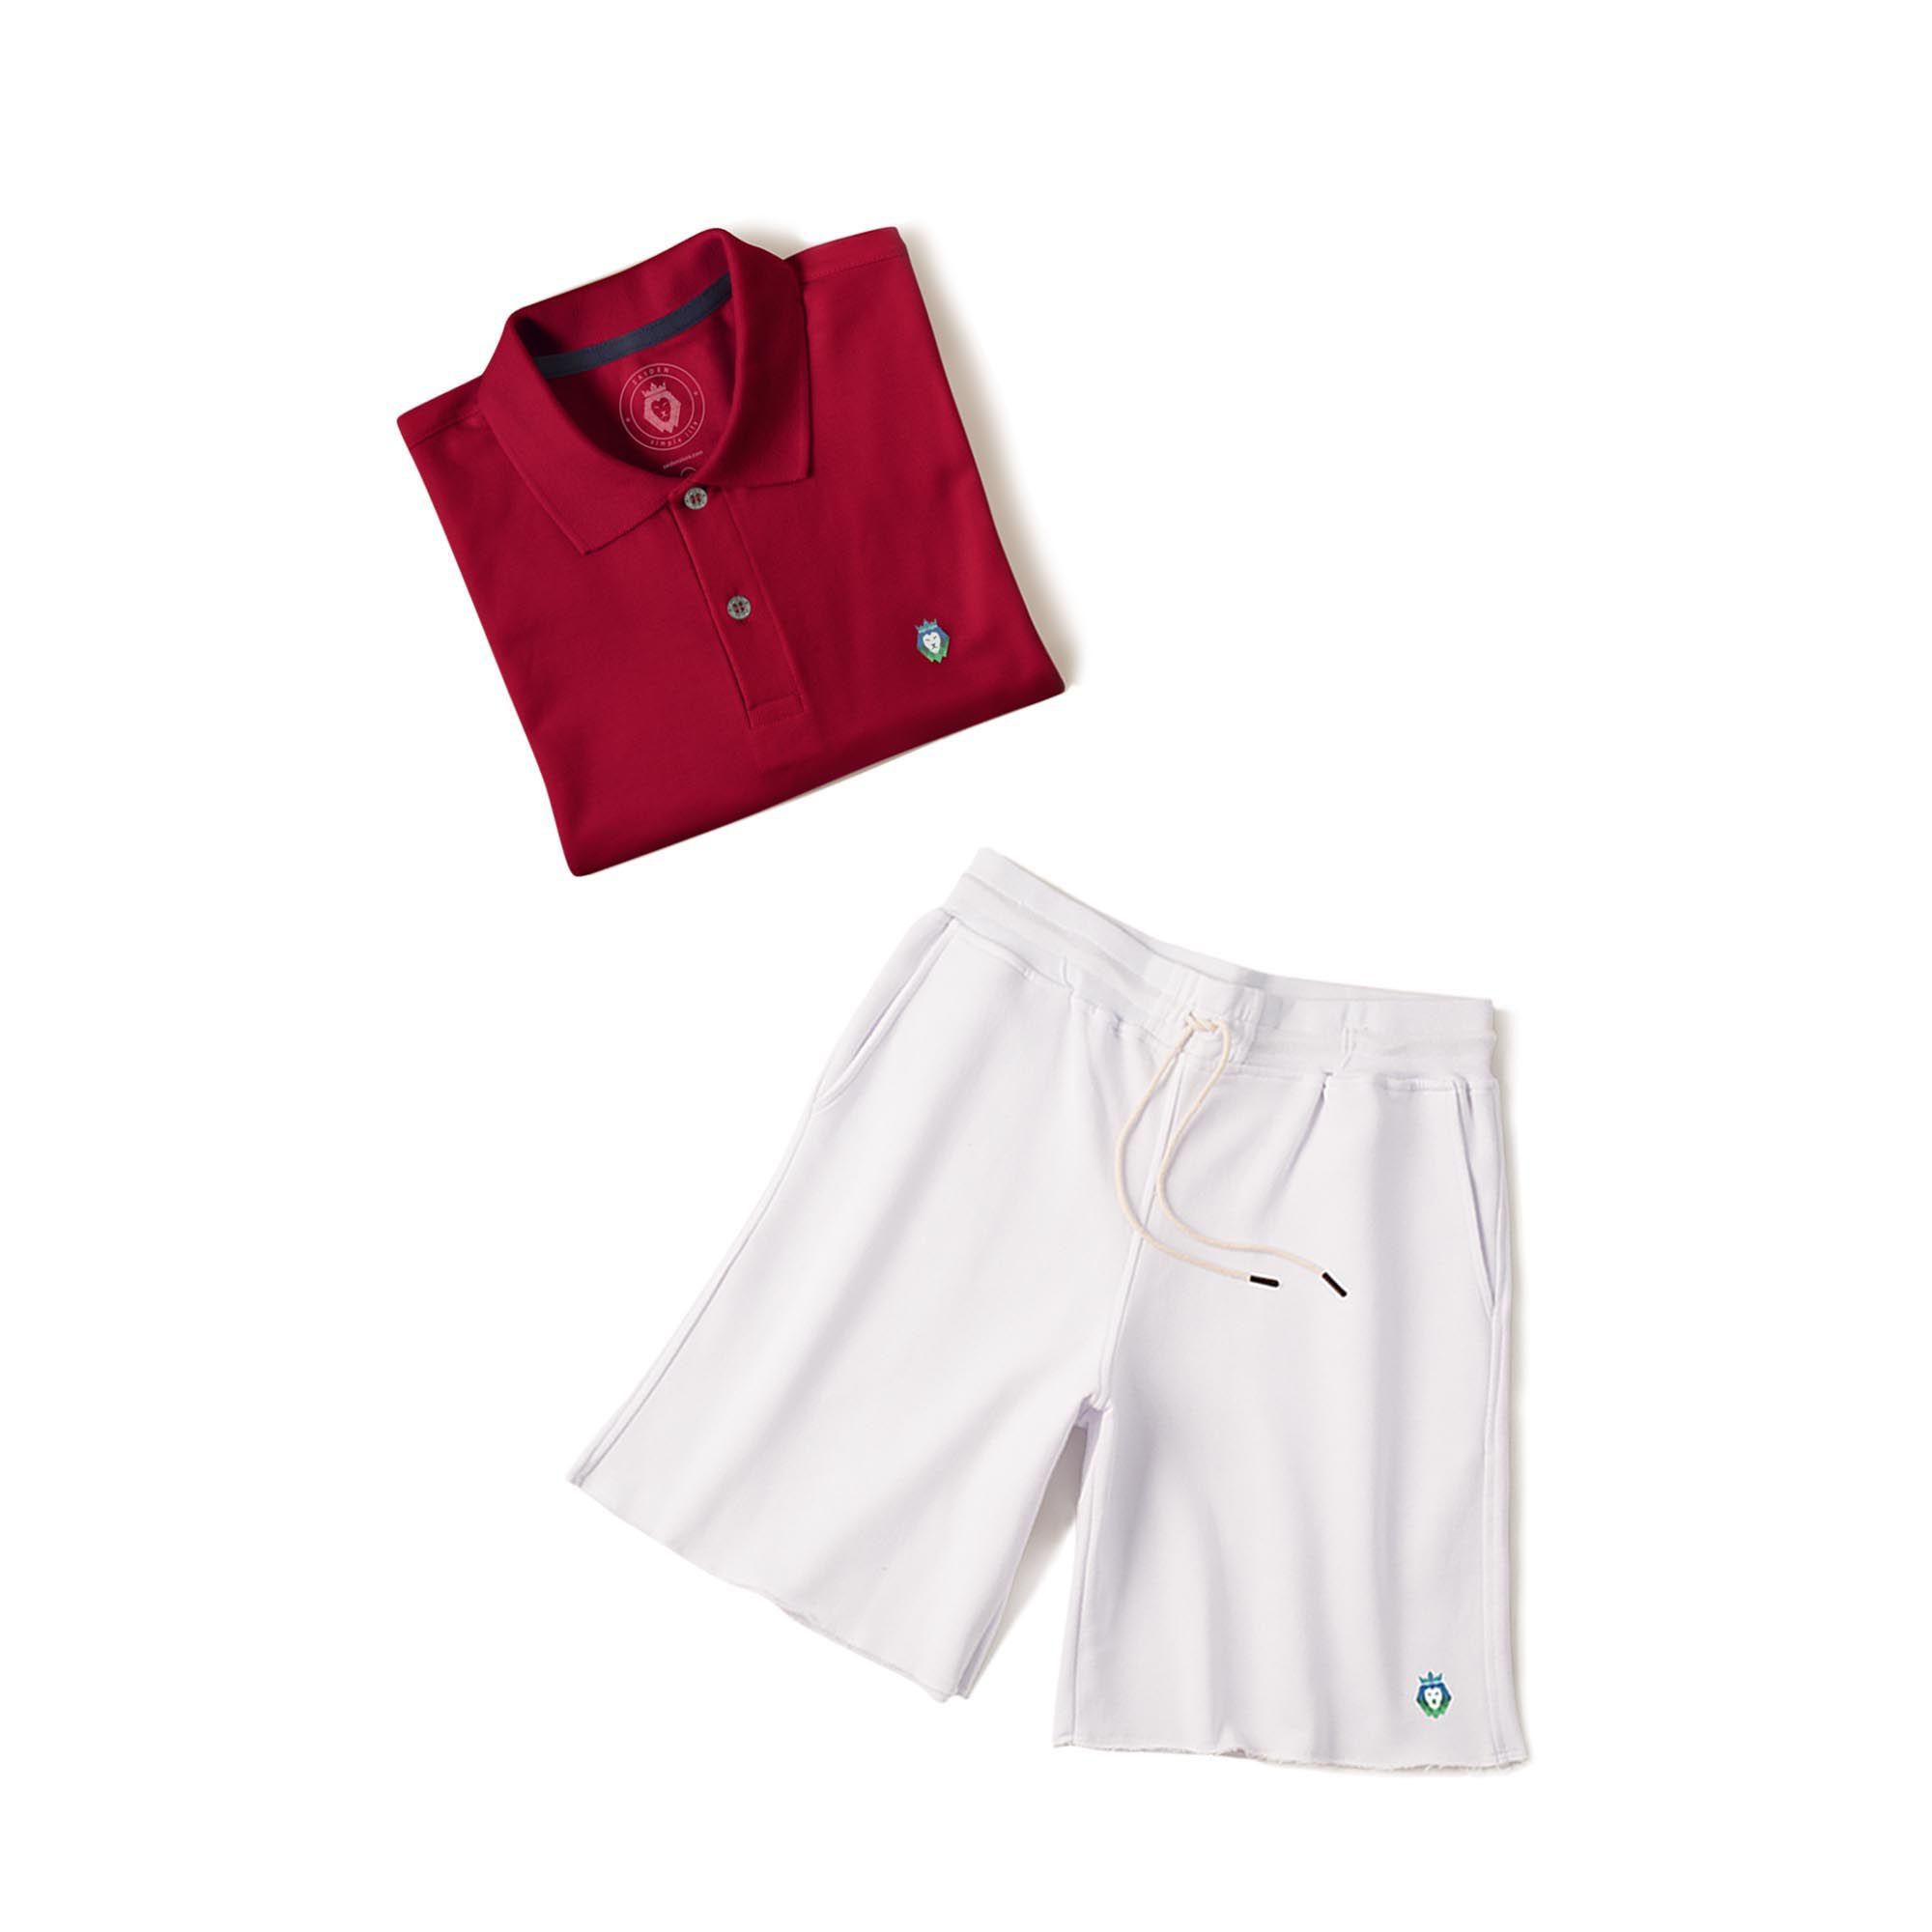 Kit 1 Bermuda Basic Branca + 1 Camisa Polo Style Bordô Zaiden Masculina